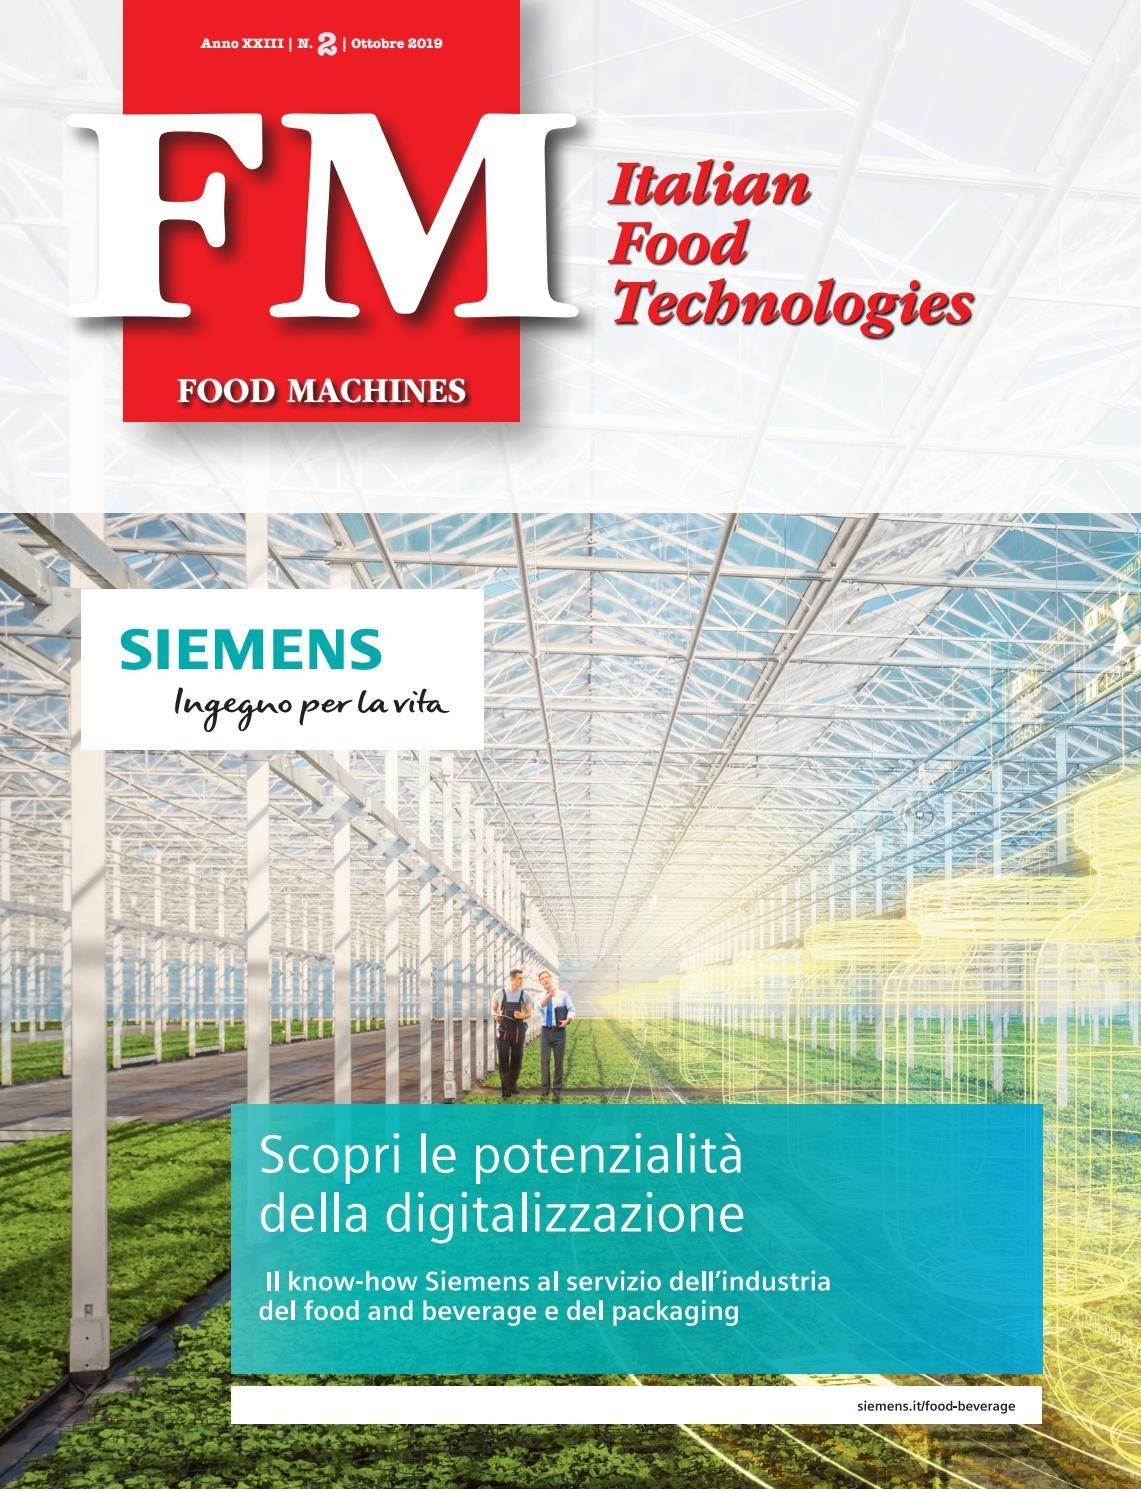 Automazione E Sicurezza Gorgonzola food machines n.2 - ottobre 2019 by innovative press srl - issuu